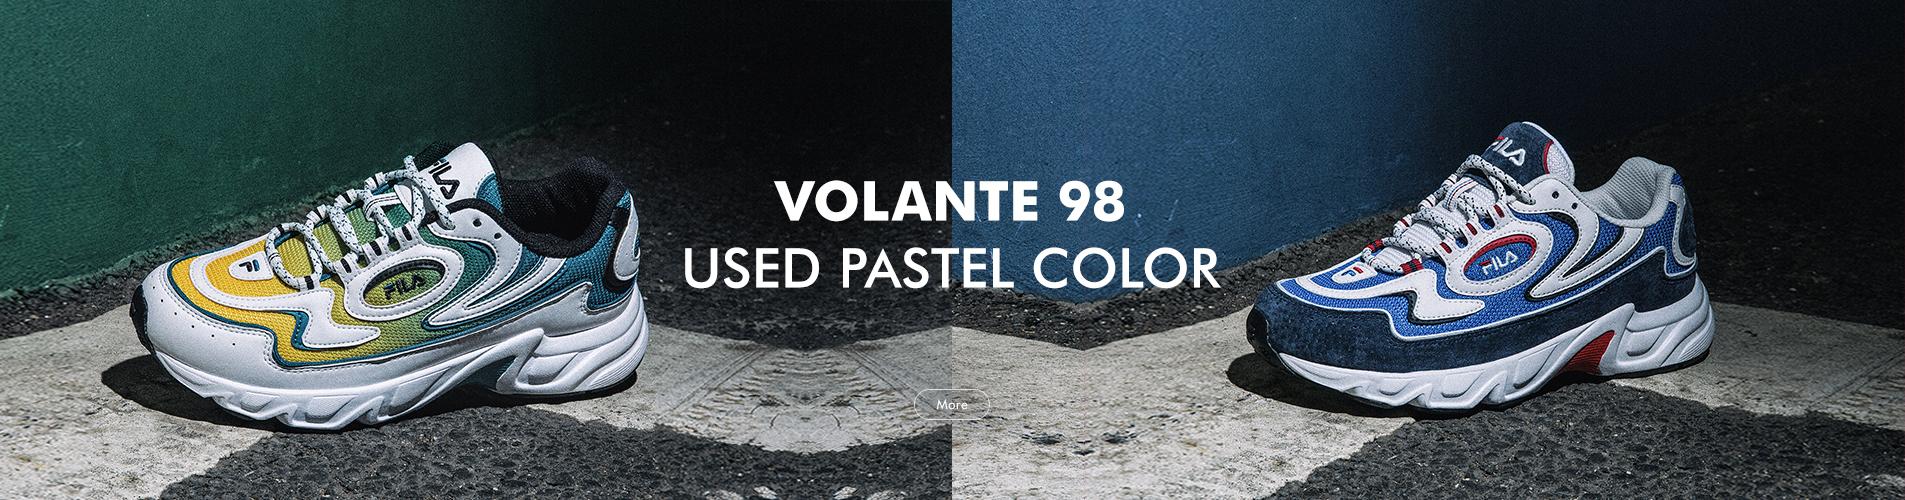 VOLANTE 98 used PASTEL COLOR